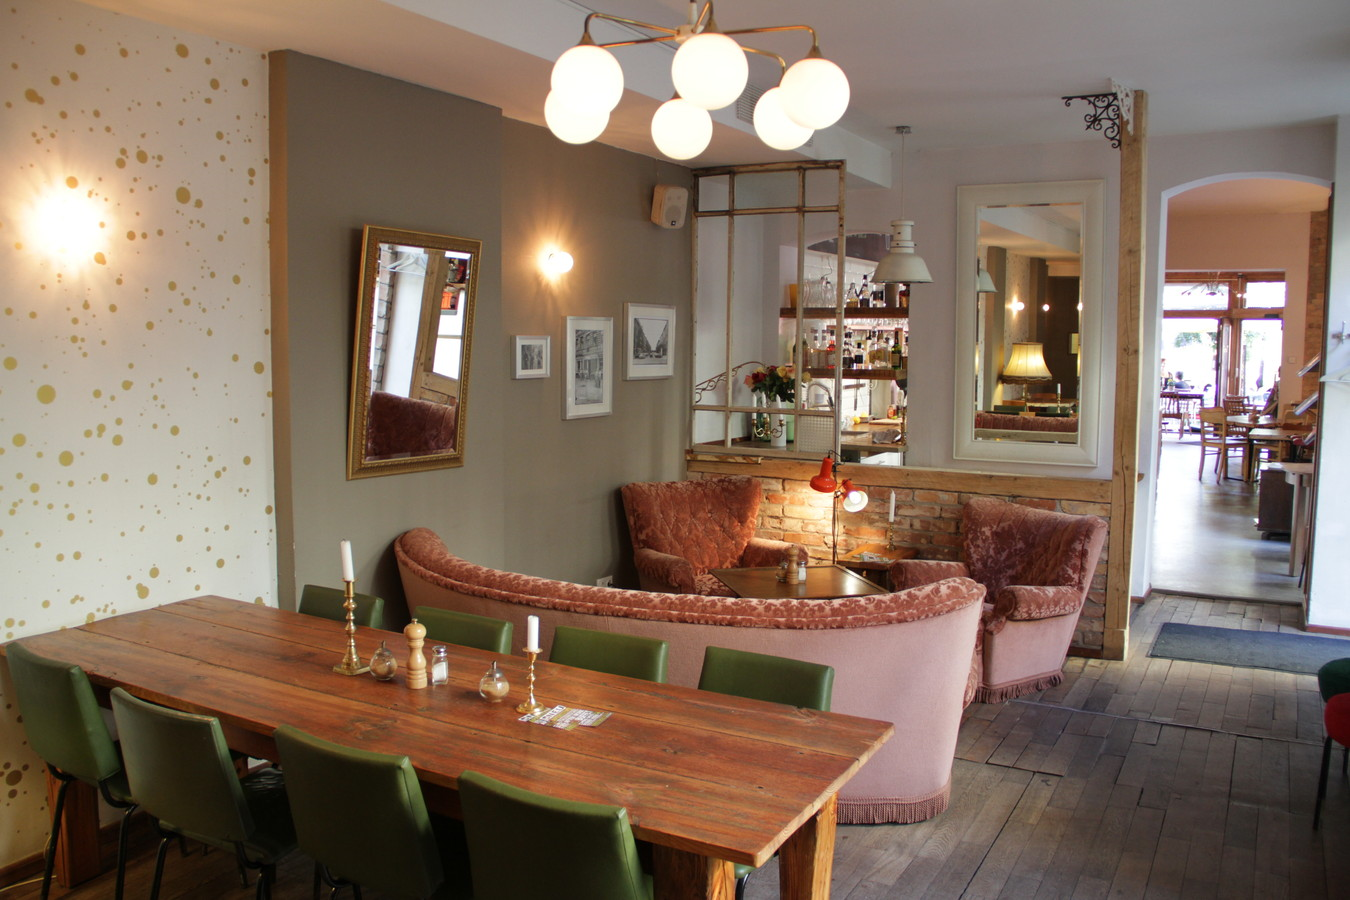 lecker fr hst cken in berlin 4 die krone that 39 s life berlin. Black Bedroom Furniture Sets. Home Design Ideas